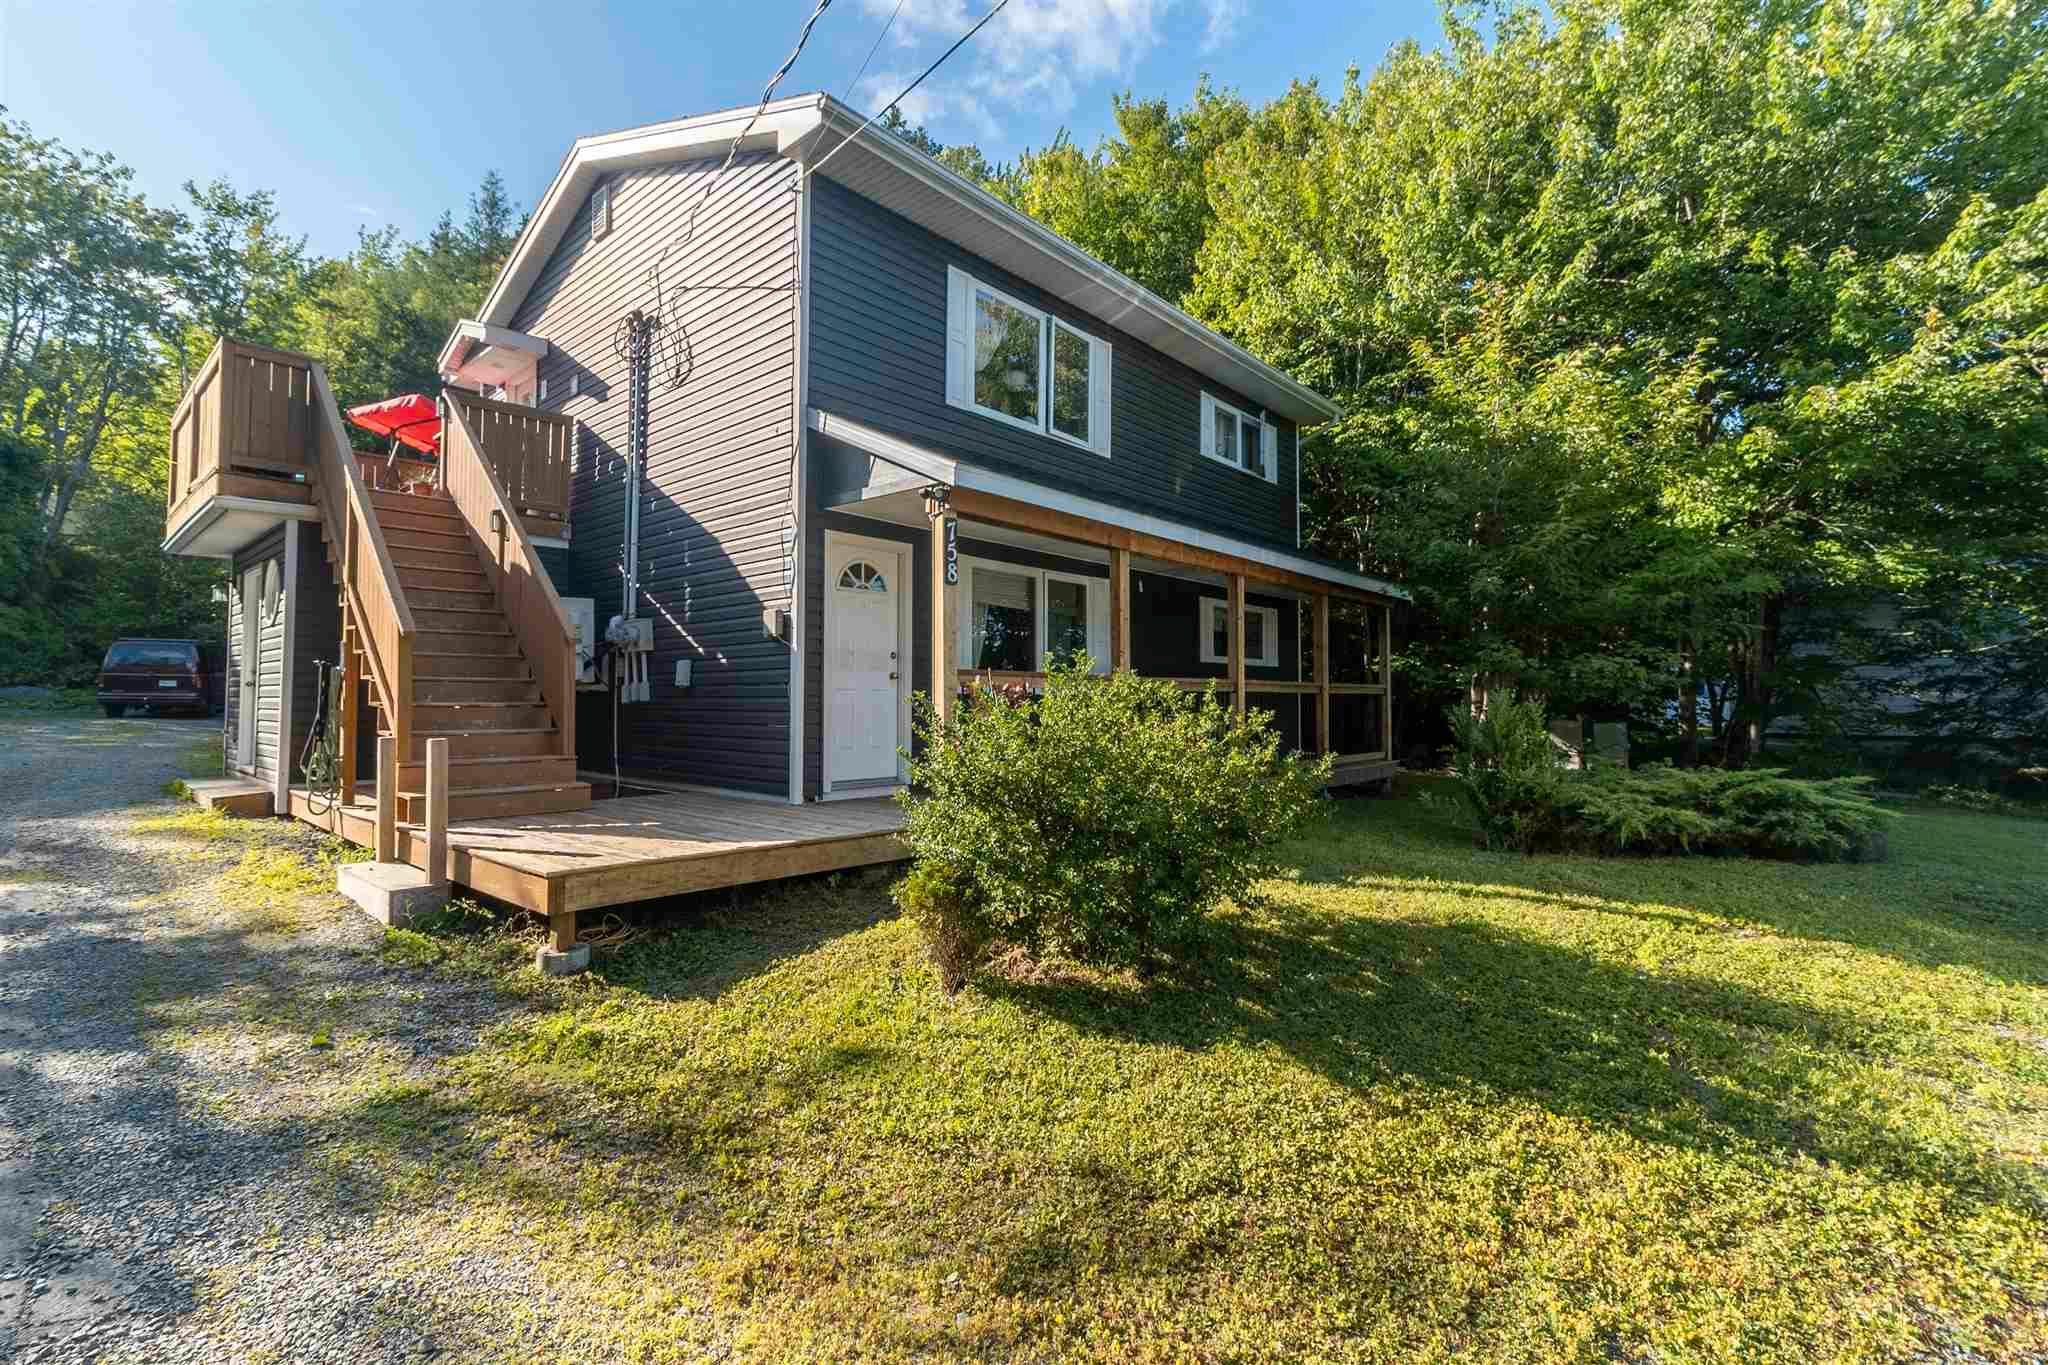 Main Photo: 758 Beaver Bank Road in Beaver Bank: 26-Beaverbank, Upper Sackville Residential for sale (Halifax-Dartmouth)  : MLS®# 202118329